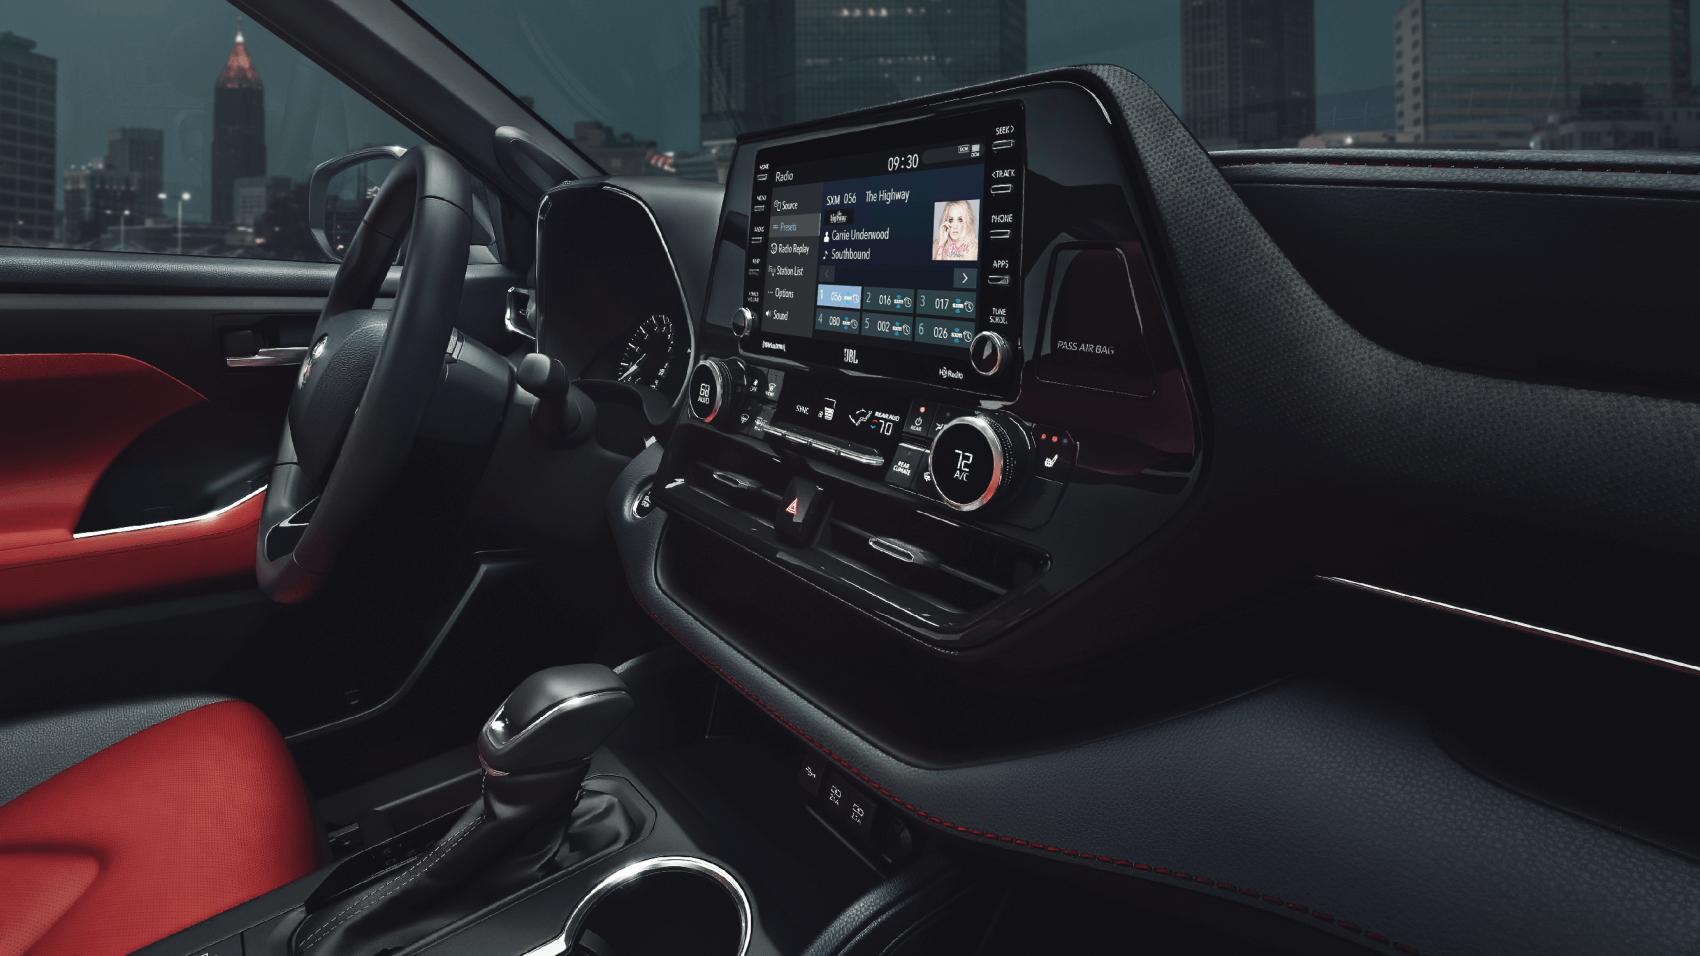 2021 Toyota Highlander Interior Tech